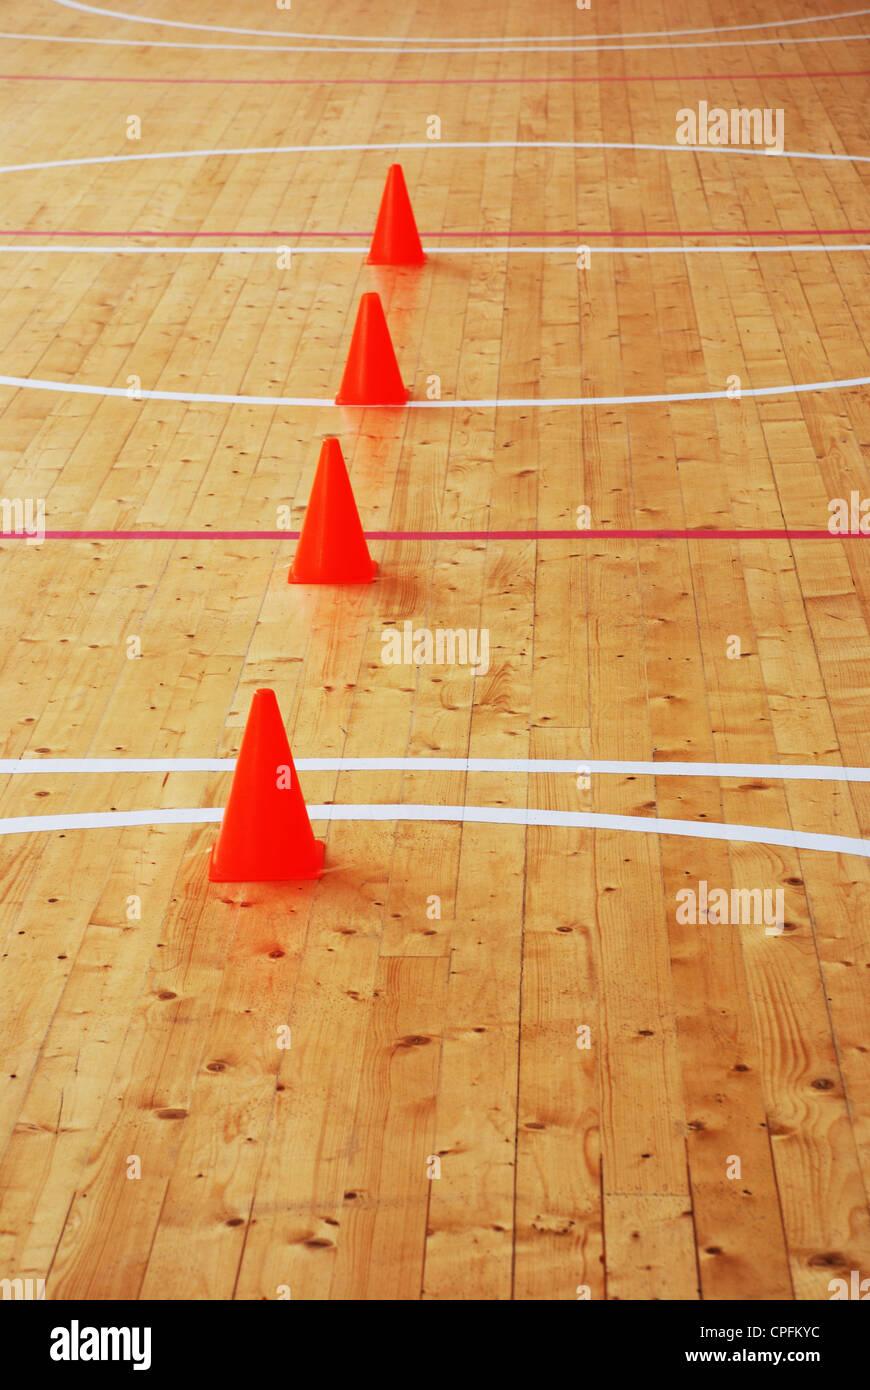 wooden parquet floor in gymnasium; vertical photo - Stock Image